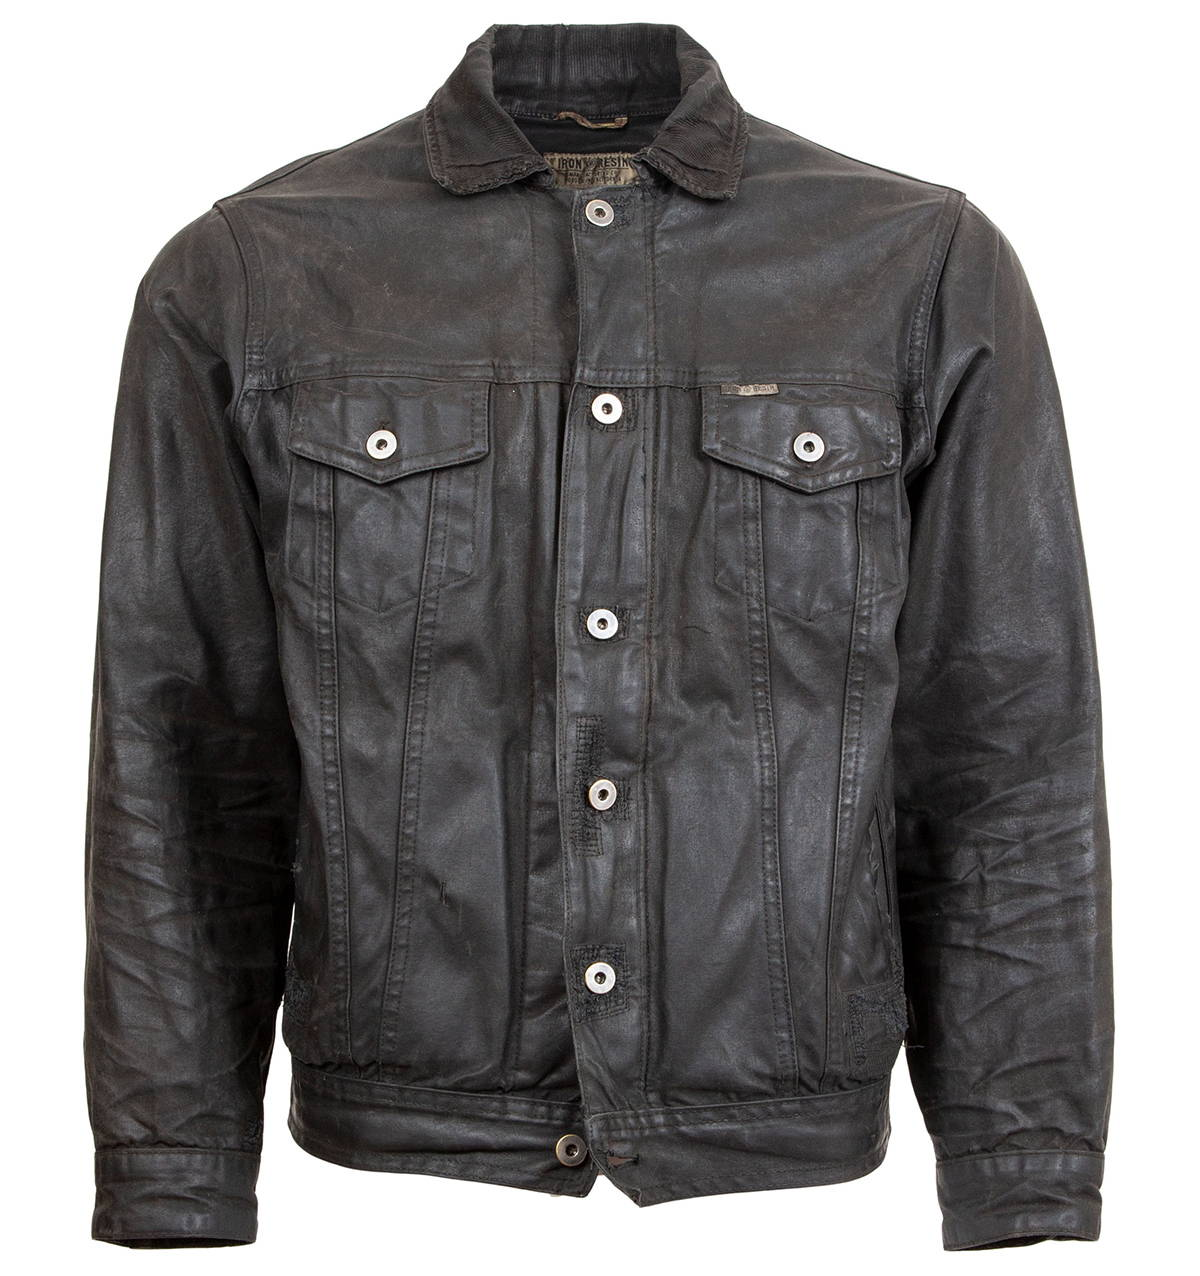 Iron & Resin Rambler Jacket Weathered & Worn Repaired Frontside